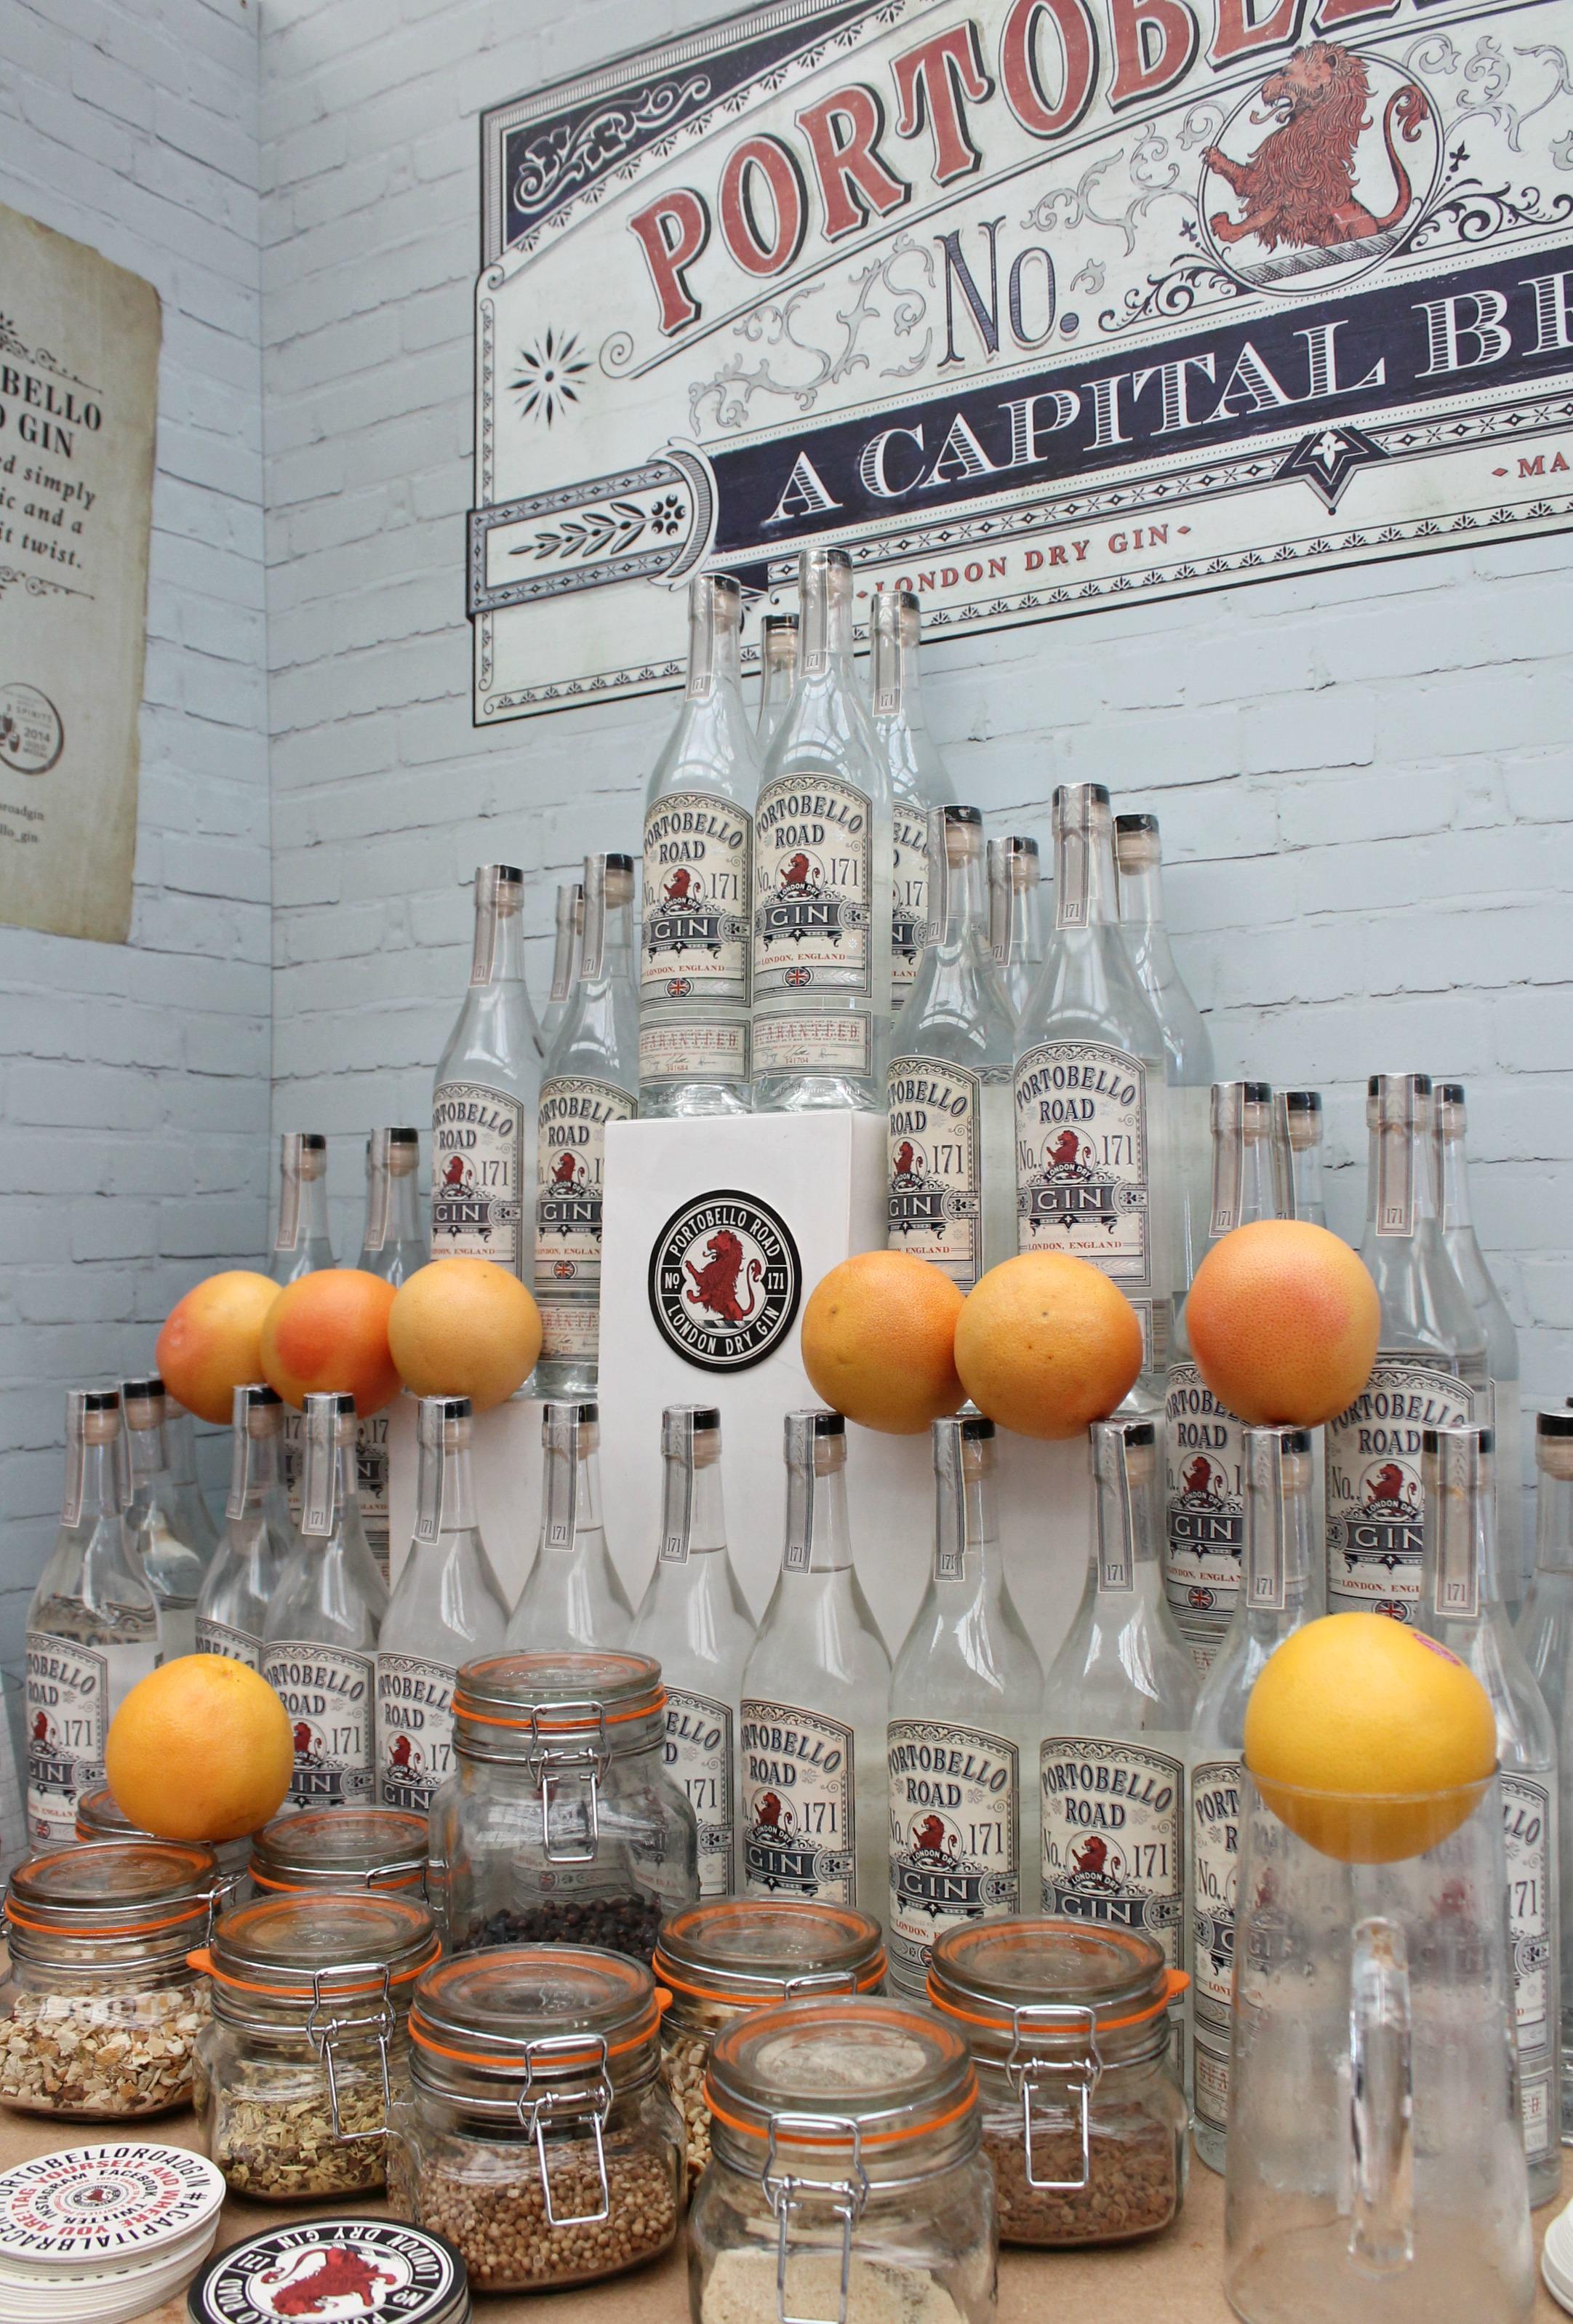 Portobello-road-gin-photo-by-Little-Big-Bell